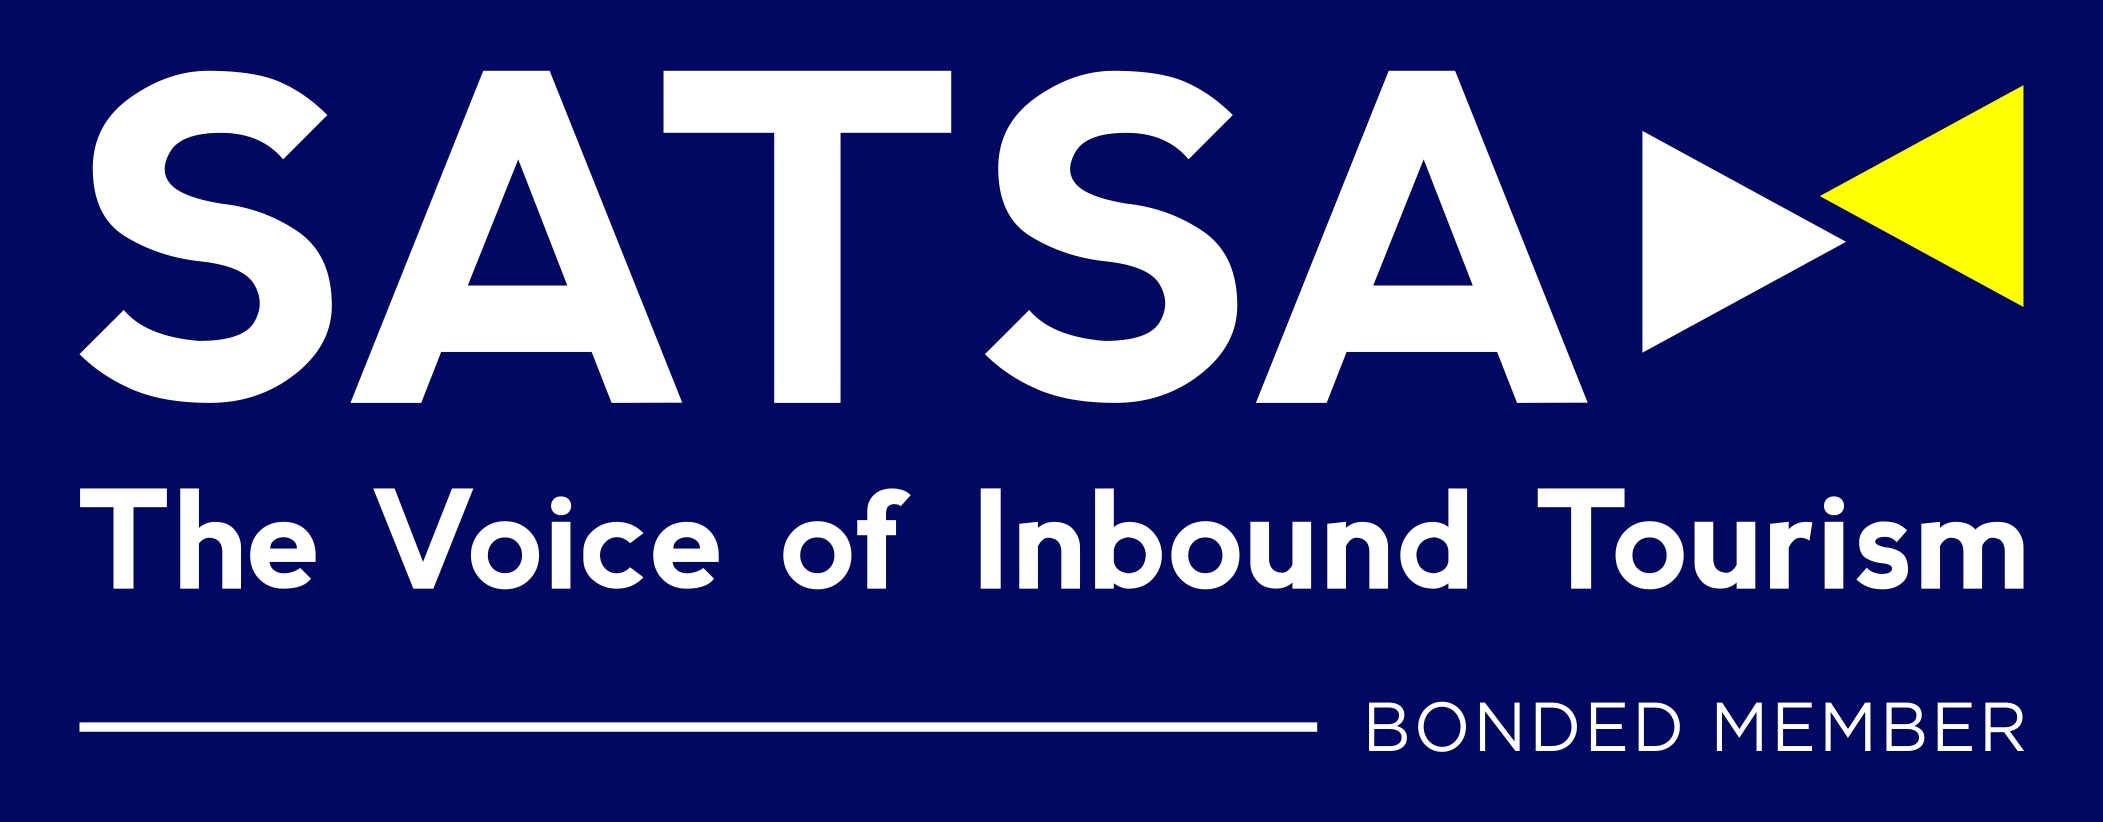 SATSA Bonded Member_JPEG_FC_inverted